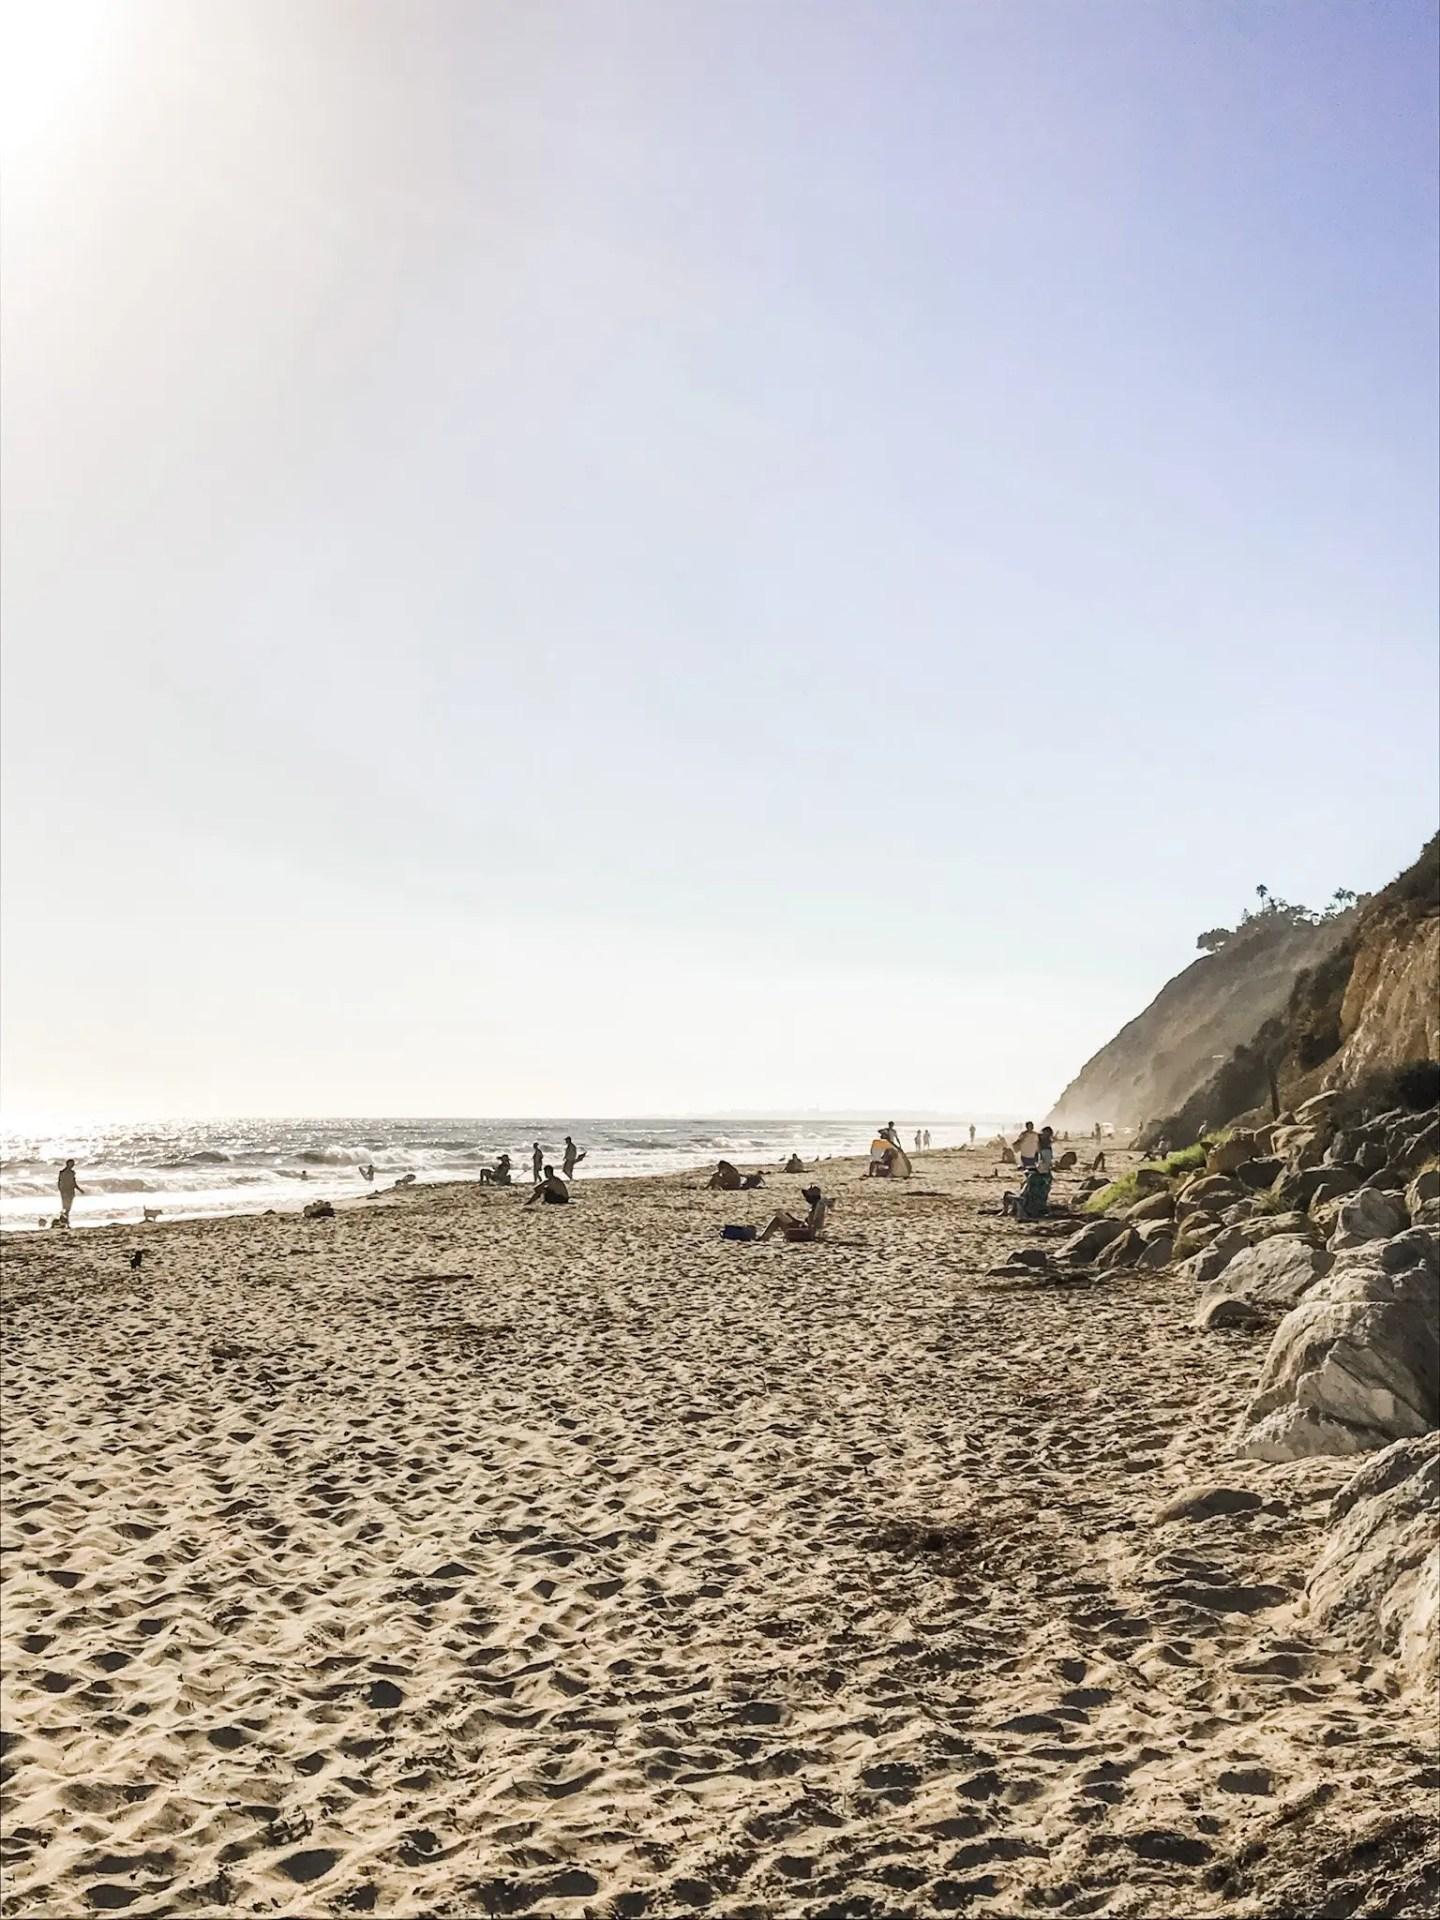 Hendry's Beach, also known as Arroyo Burro County Beach Park